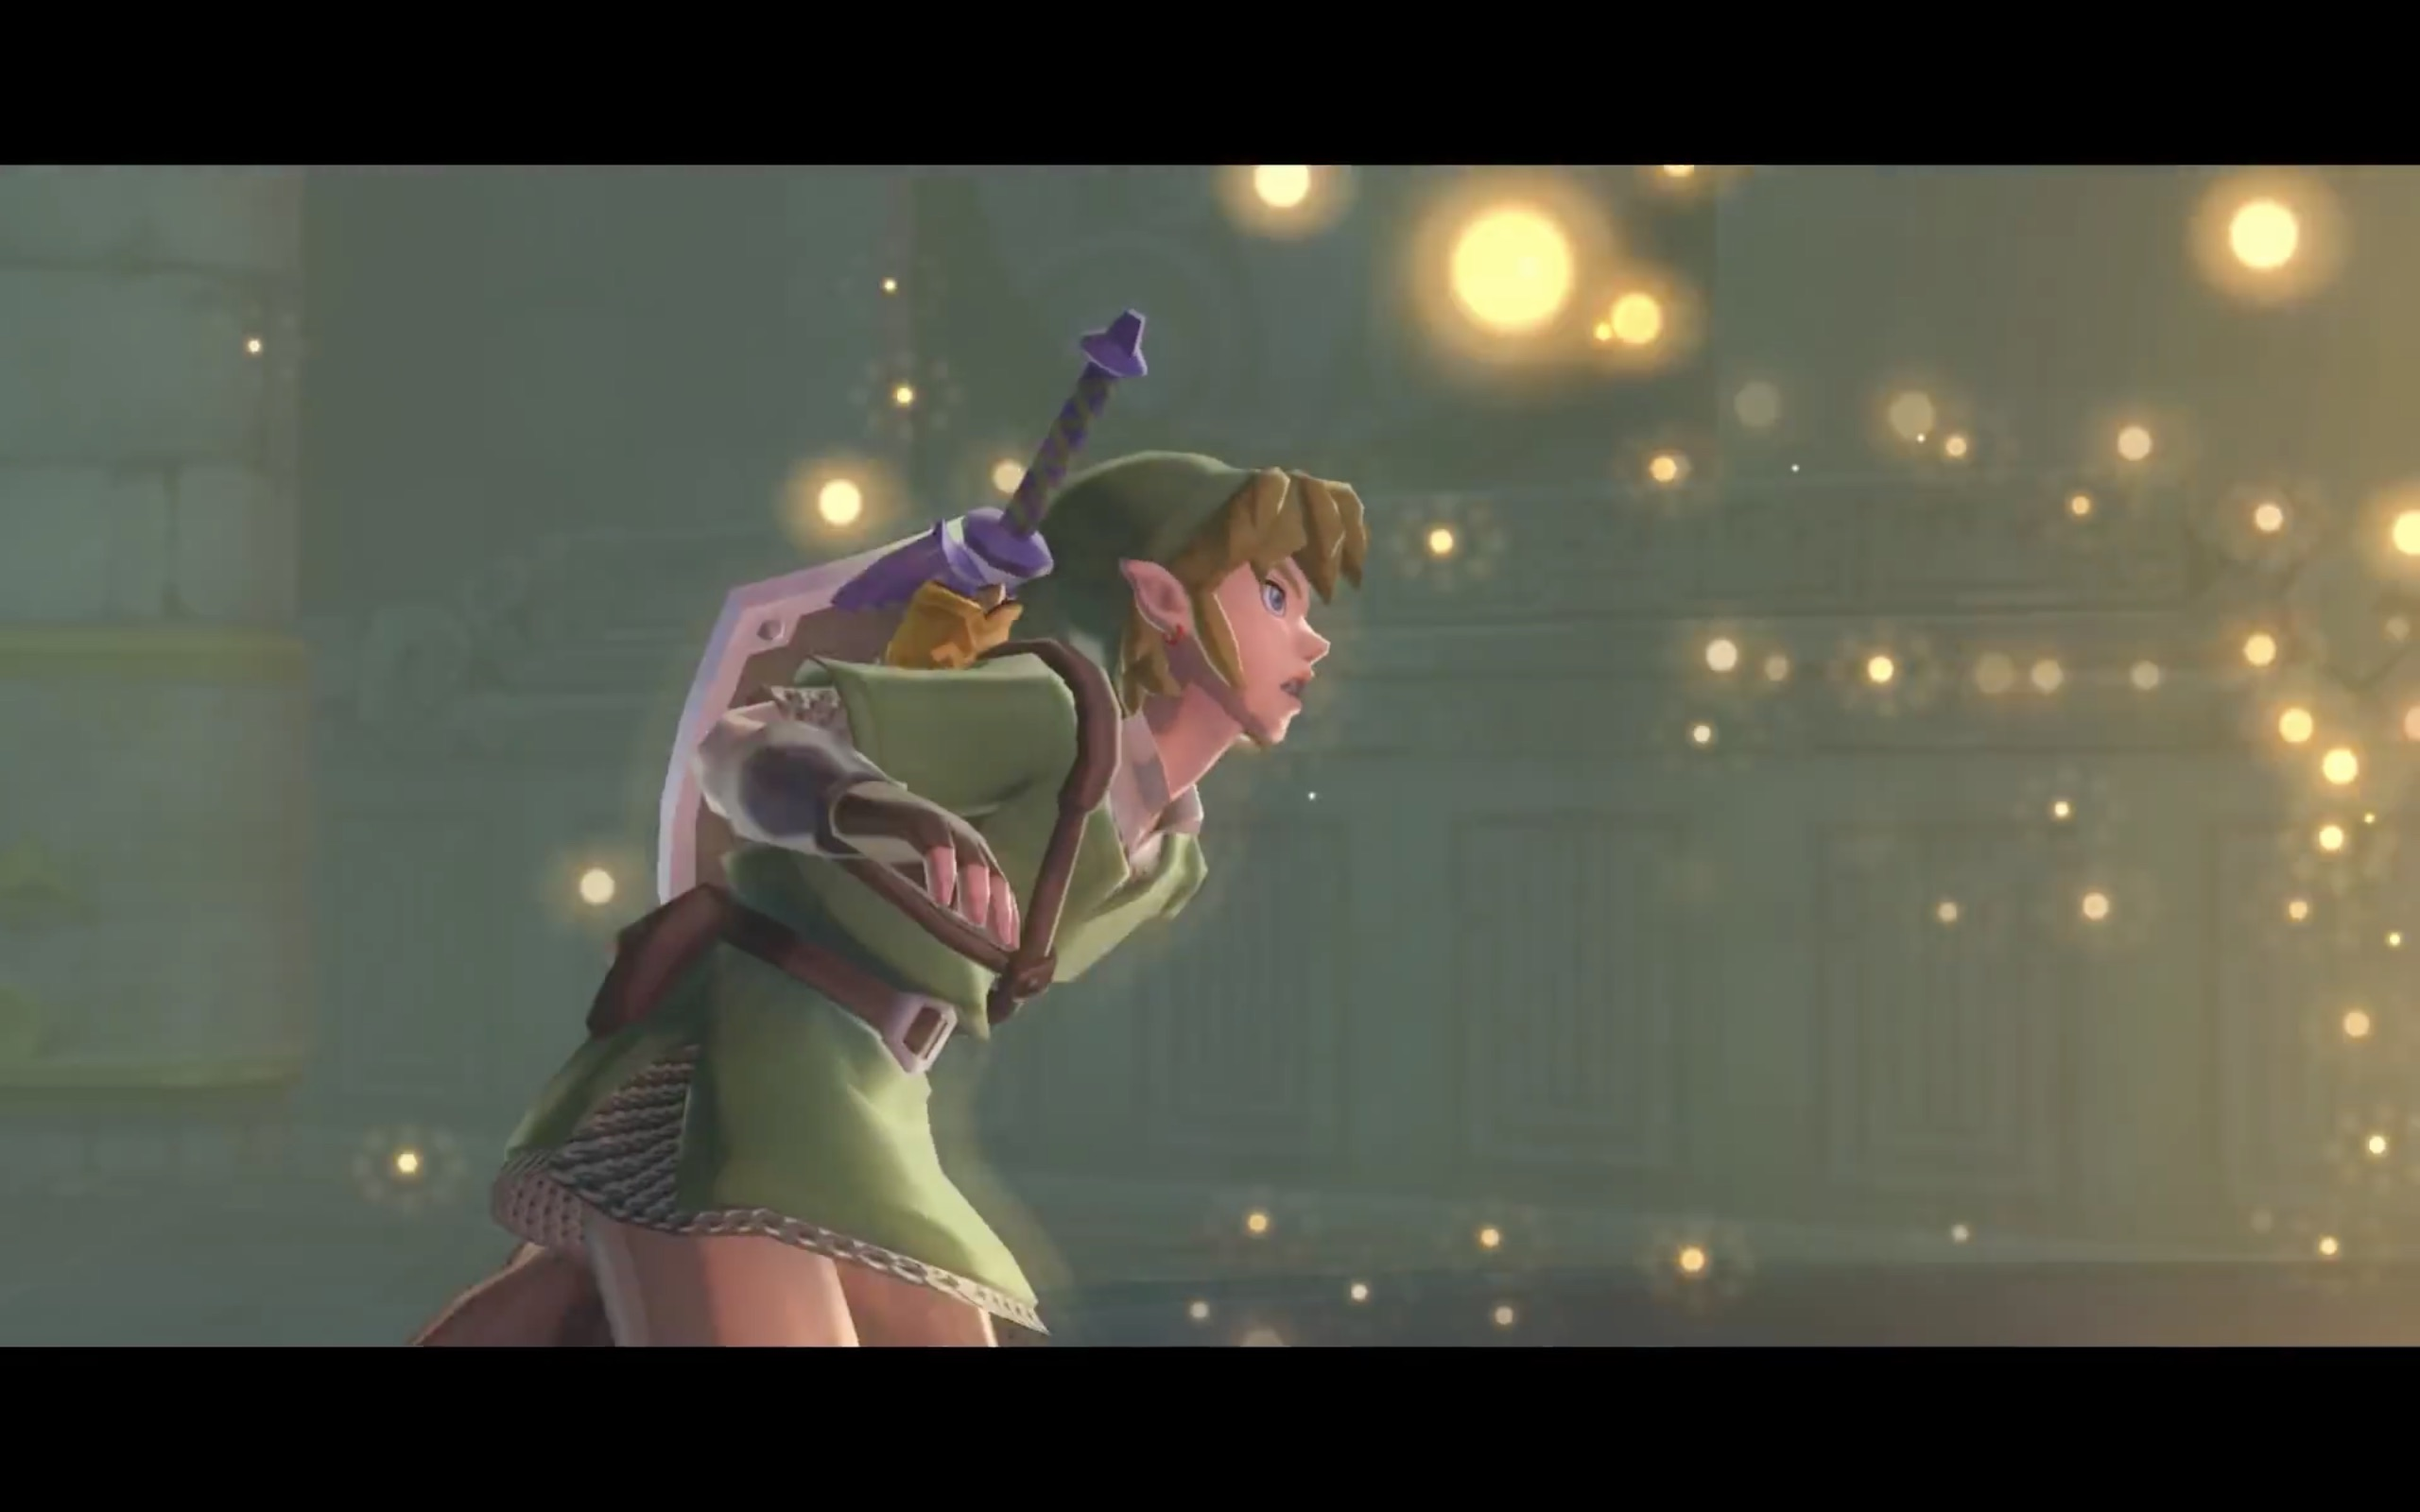 Grezzo Hiring to Bring HD Zelda Games to Switch